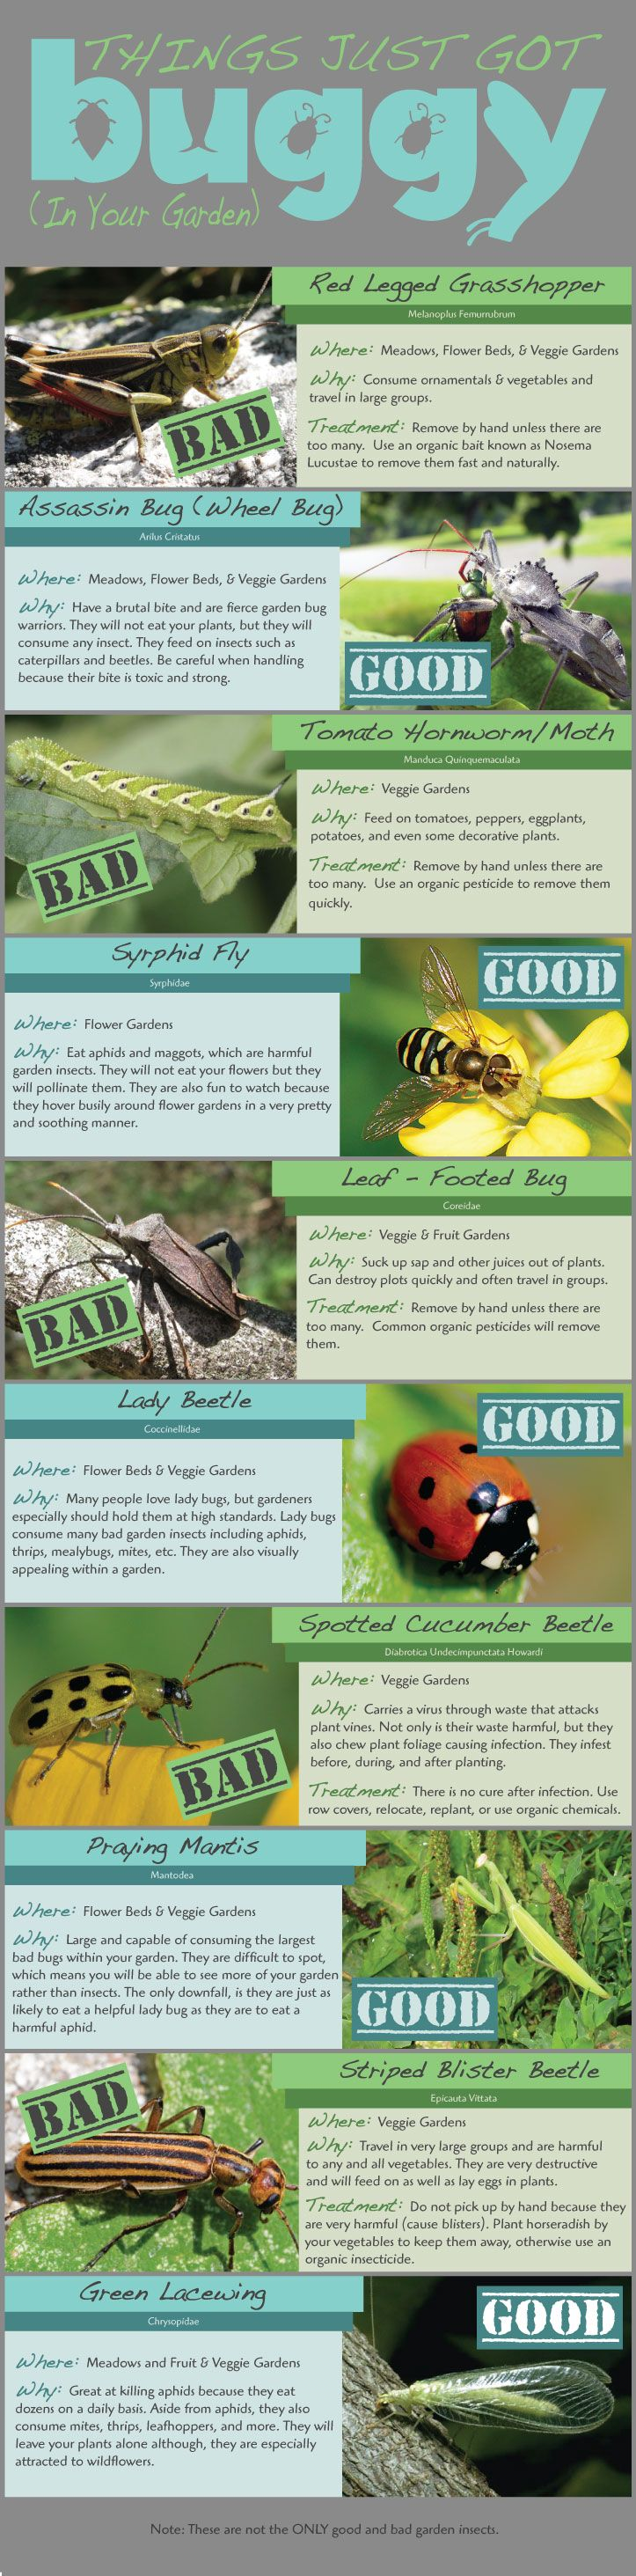 Guide to 10 Garden Bugs!